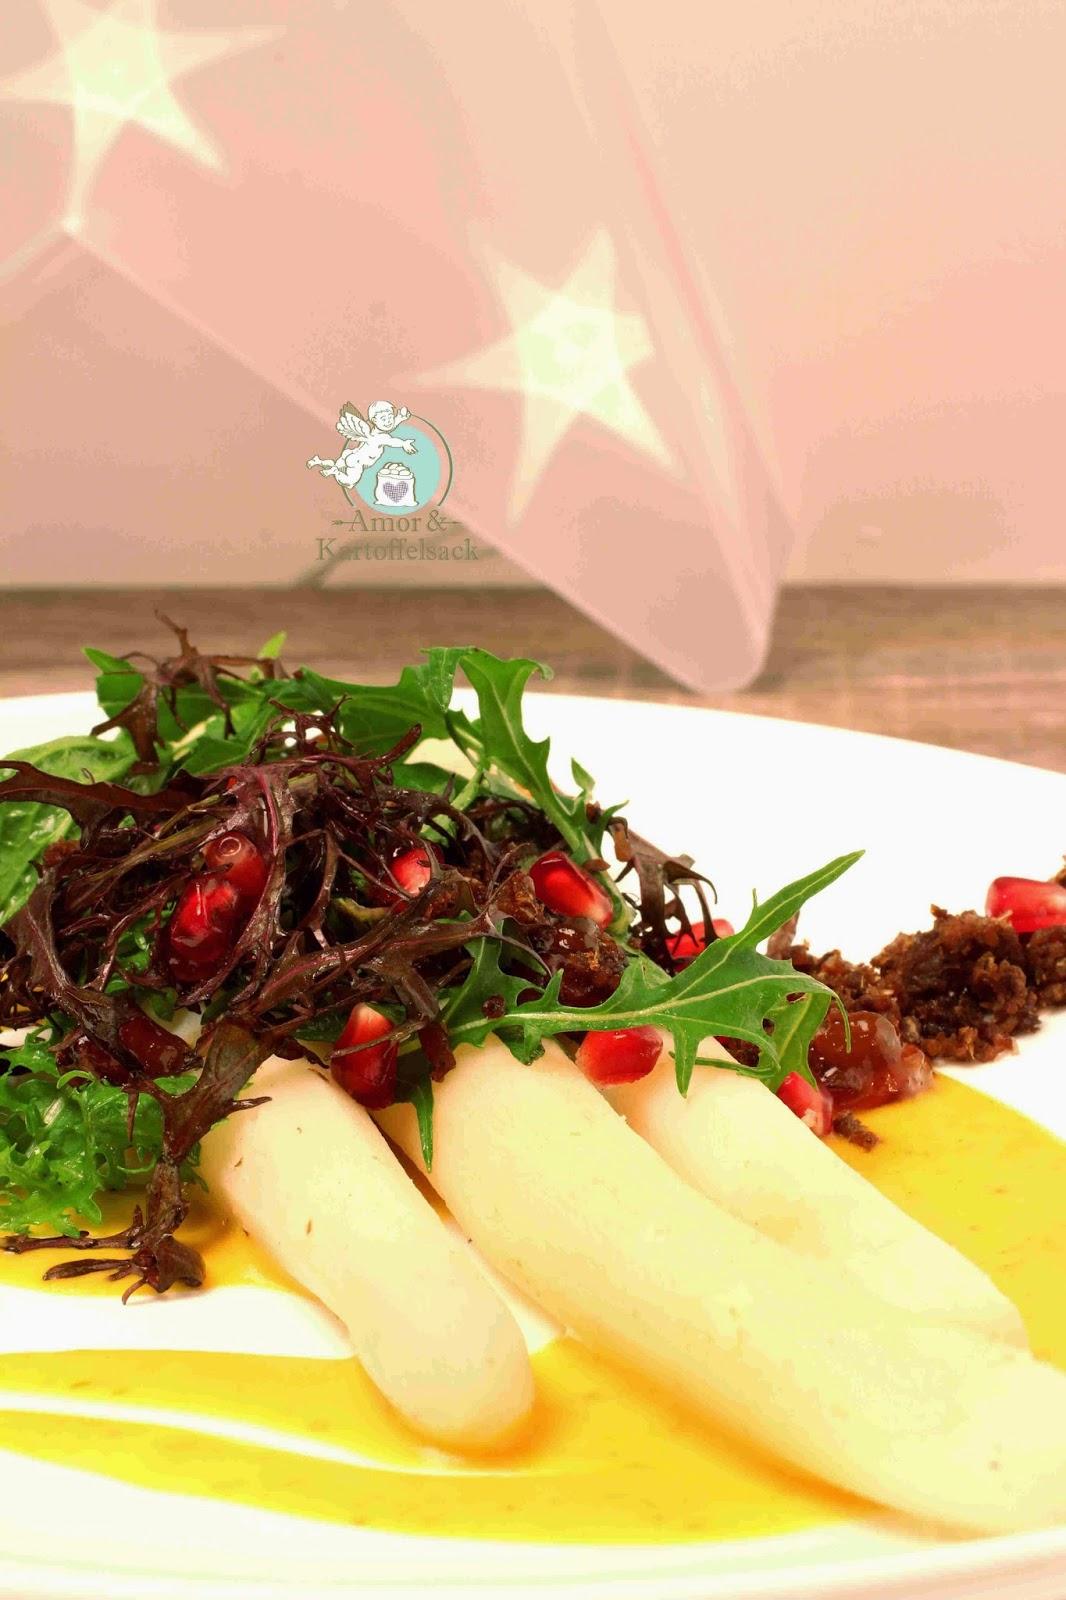 Schwarzwurzel Safran Aprikose Granatapfel Zimt Salat